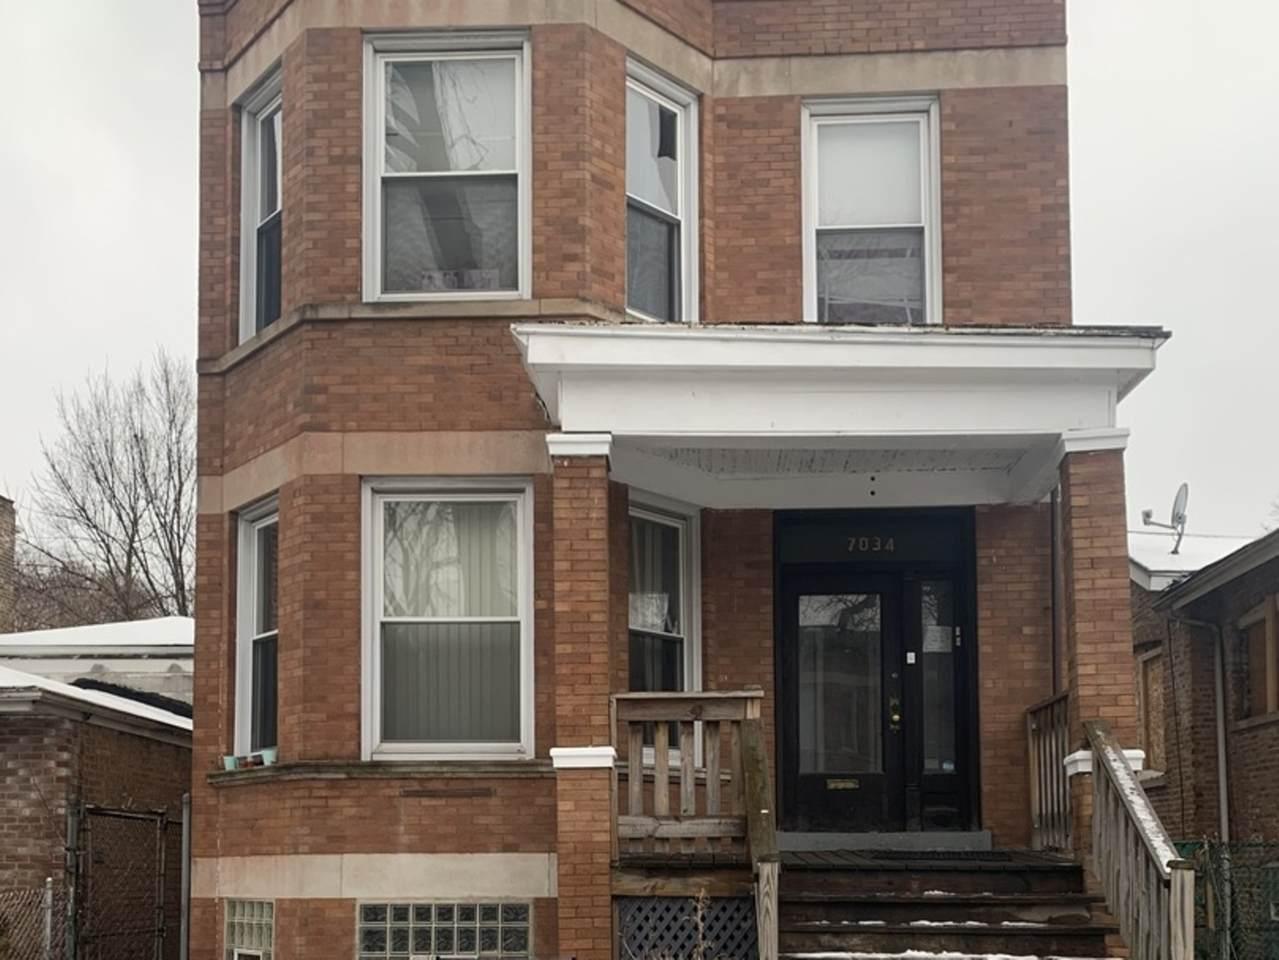 7034 Carpenter Street - Photo 1